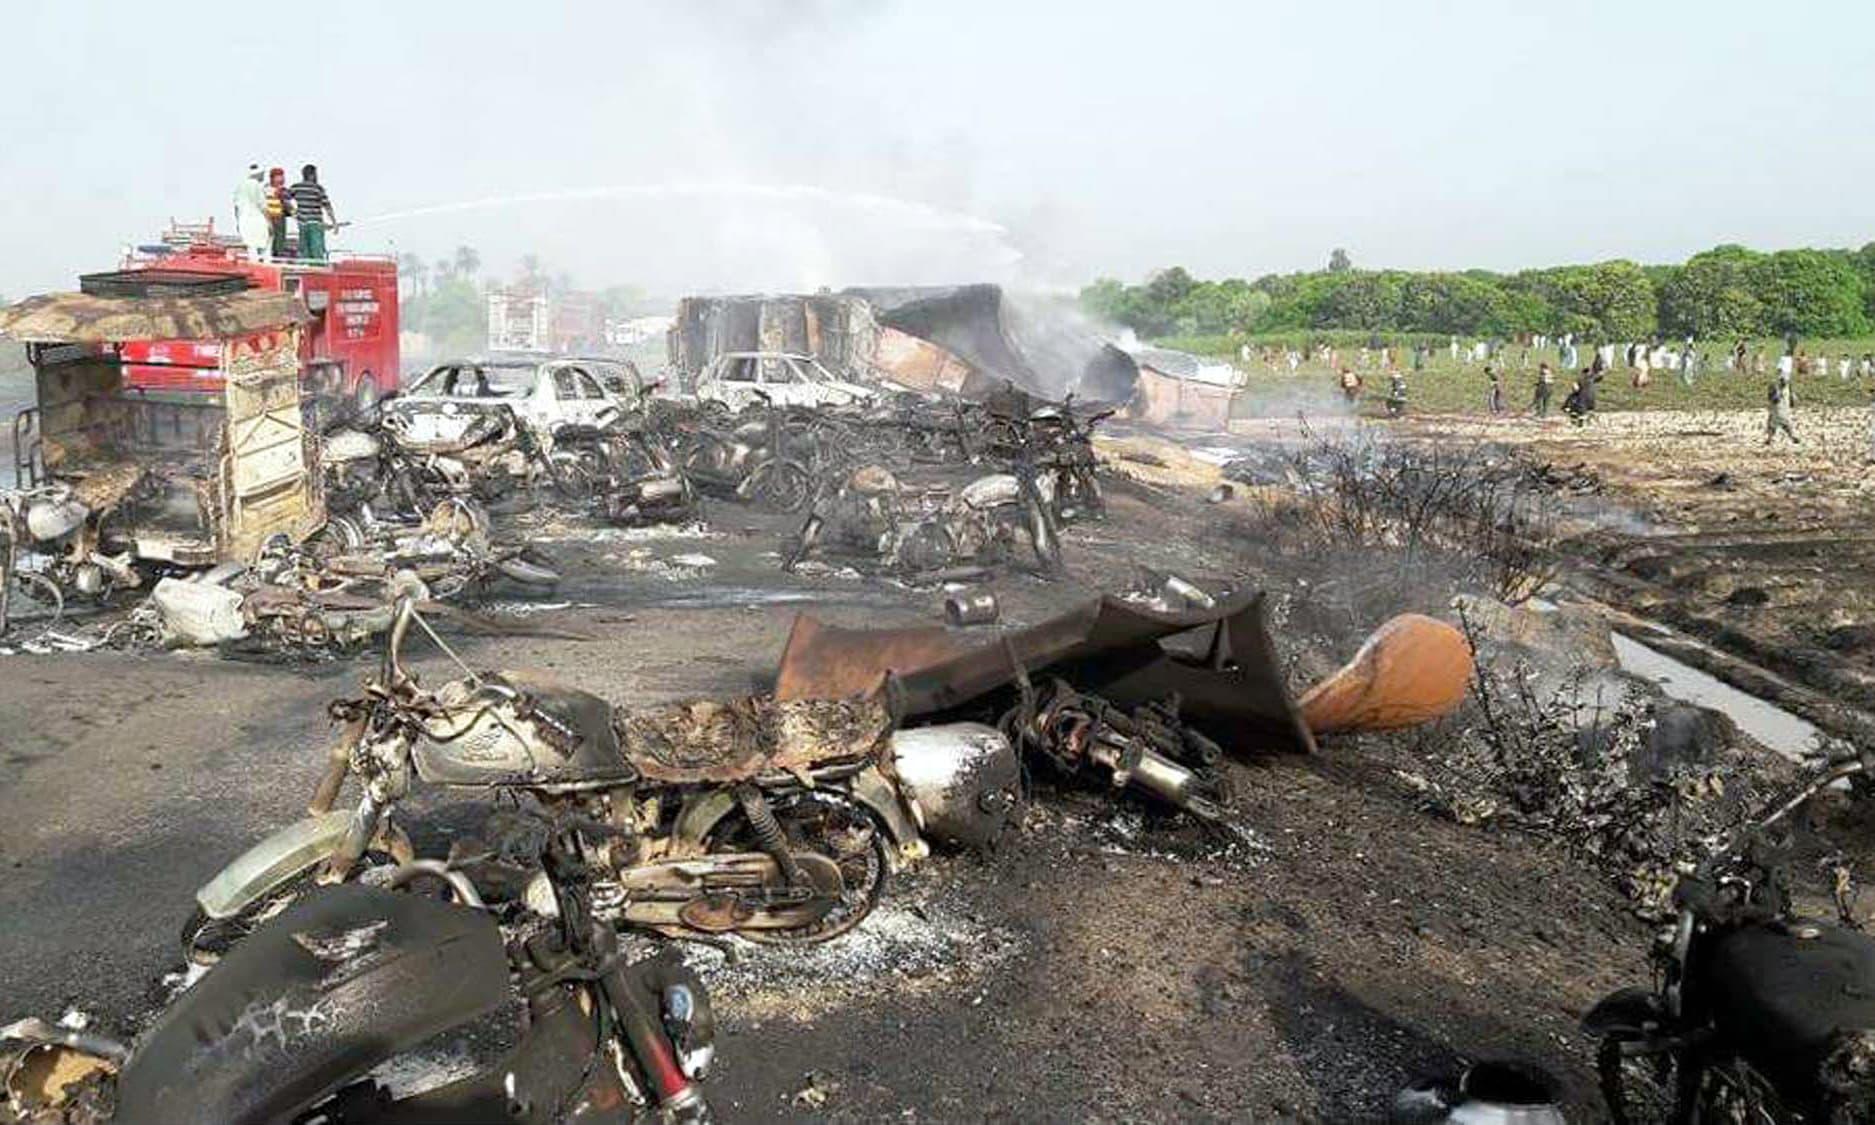 Death toll from Bahawalpur oil tanker fire climbs to 153